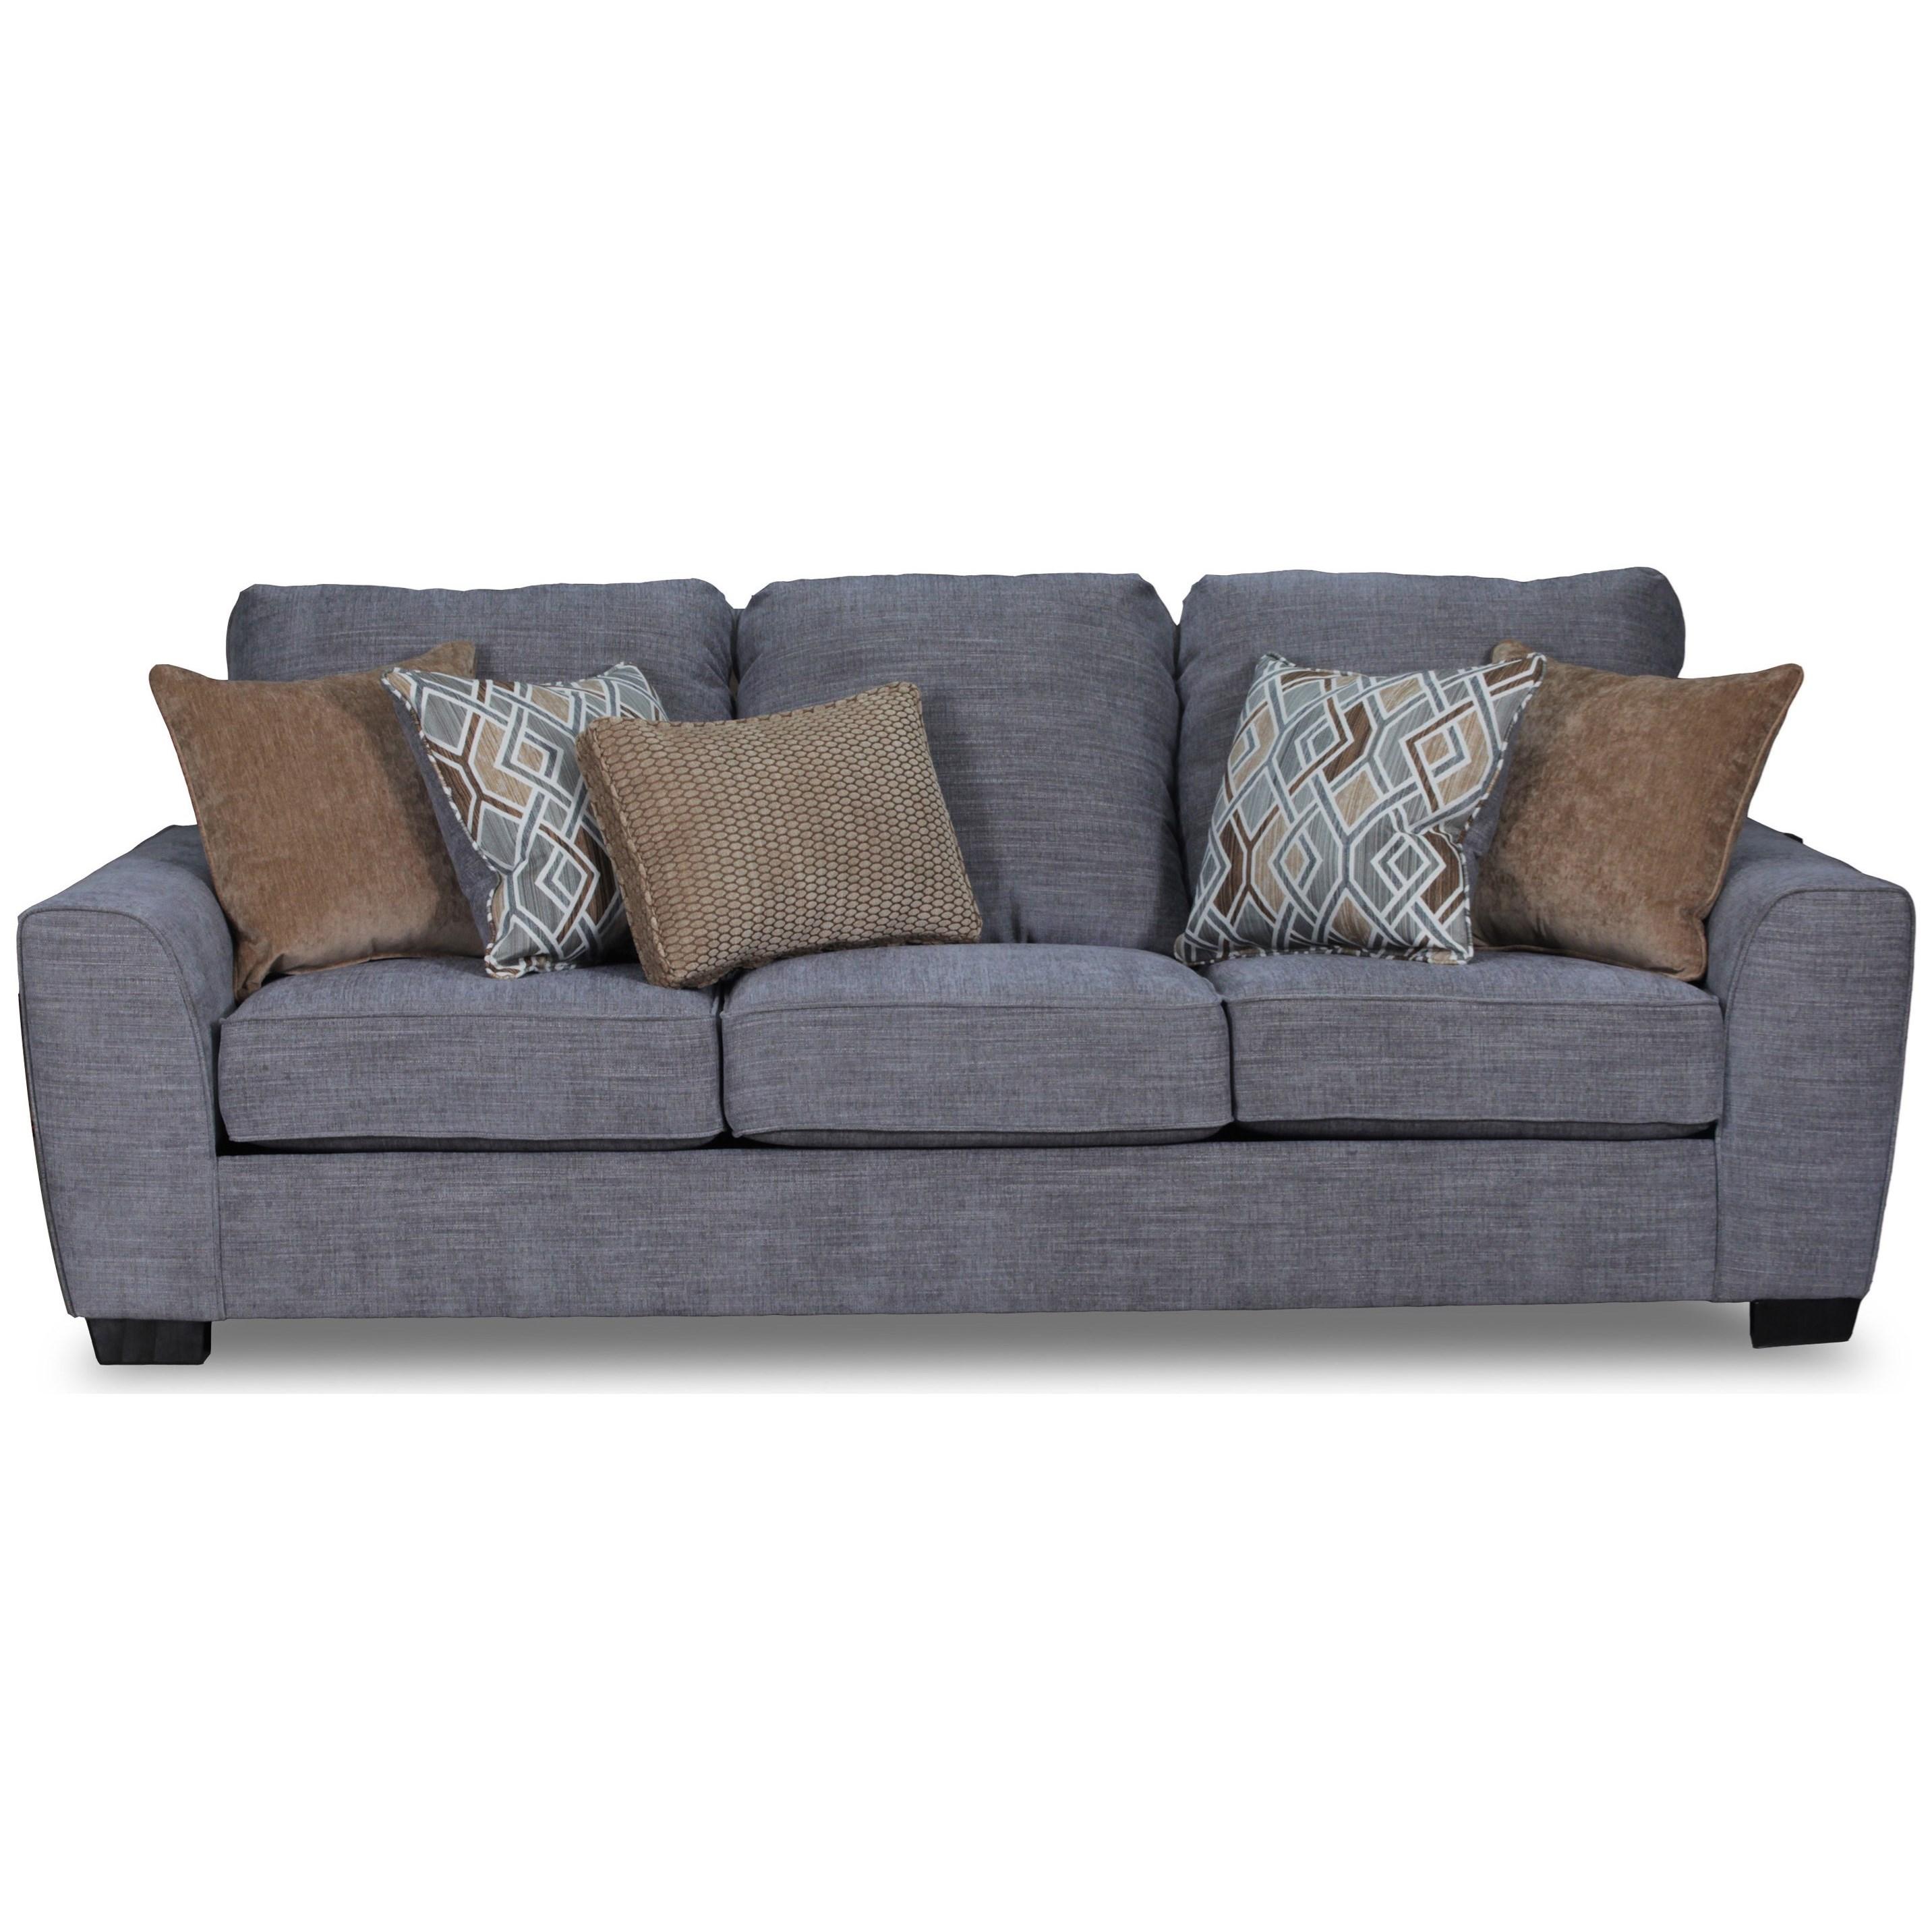 United Furniture Industries 9770BR Sofa - Item Number: 9770BRSofa-Pompeii Silver